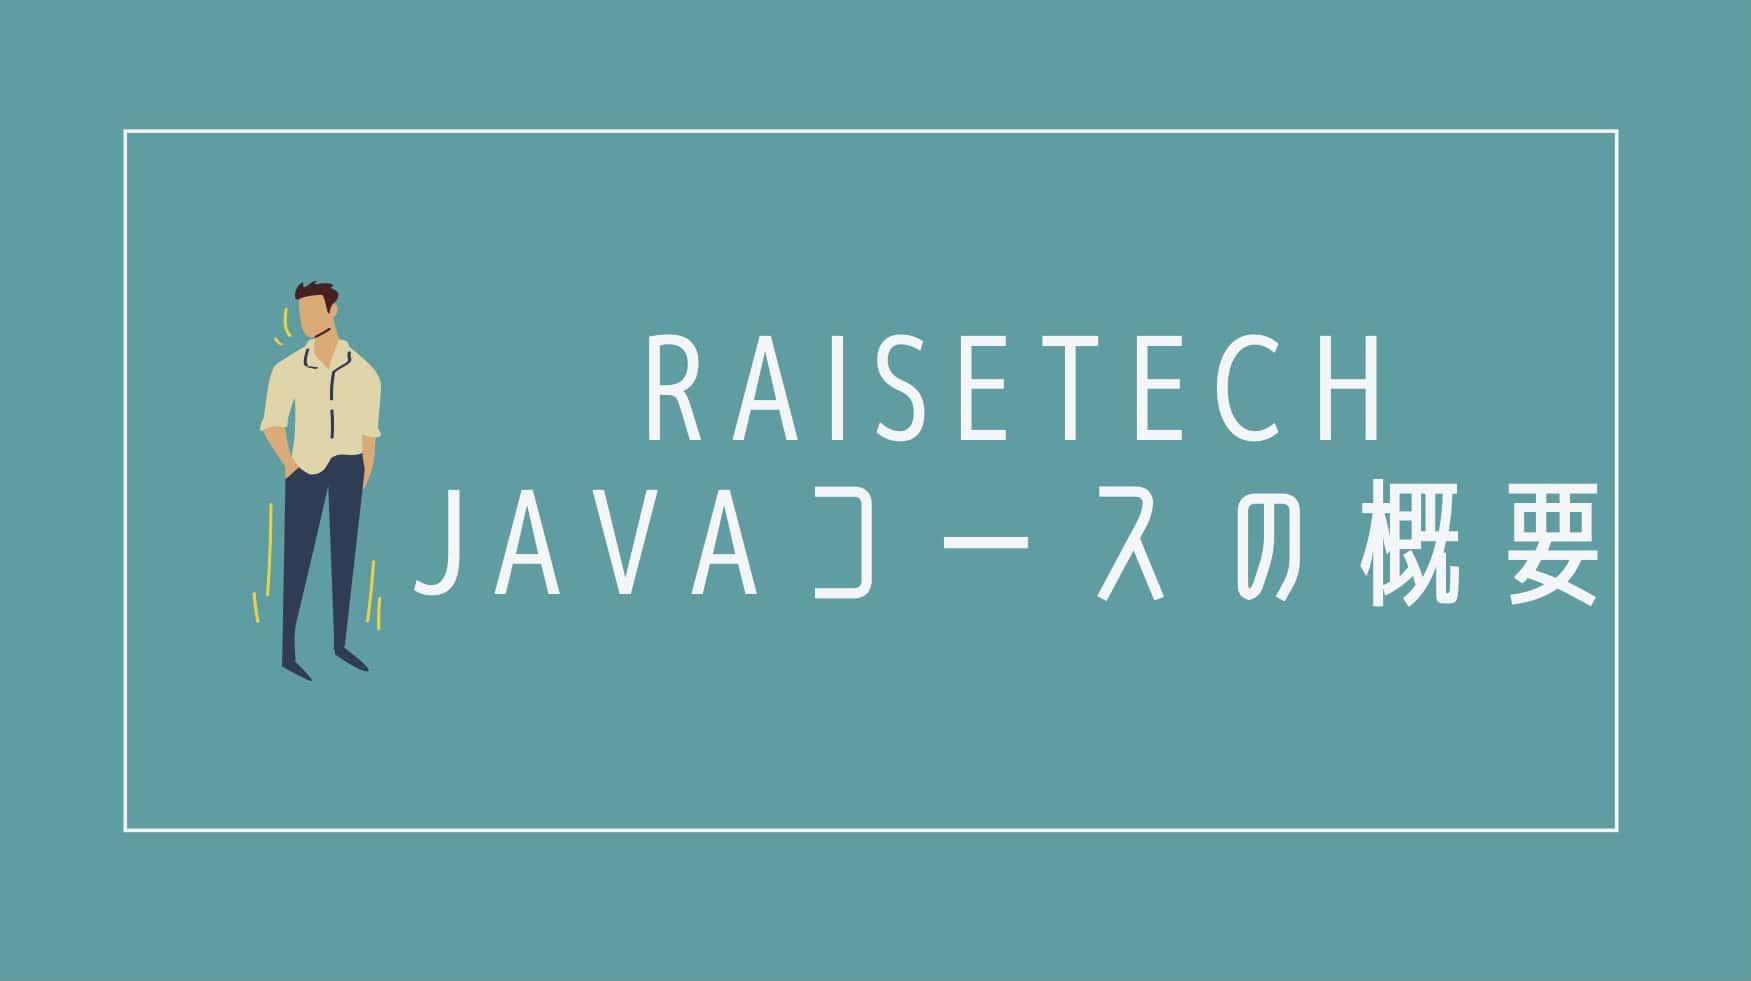 RaisetechのJavaコース概要は?